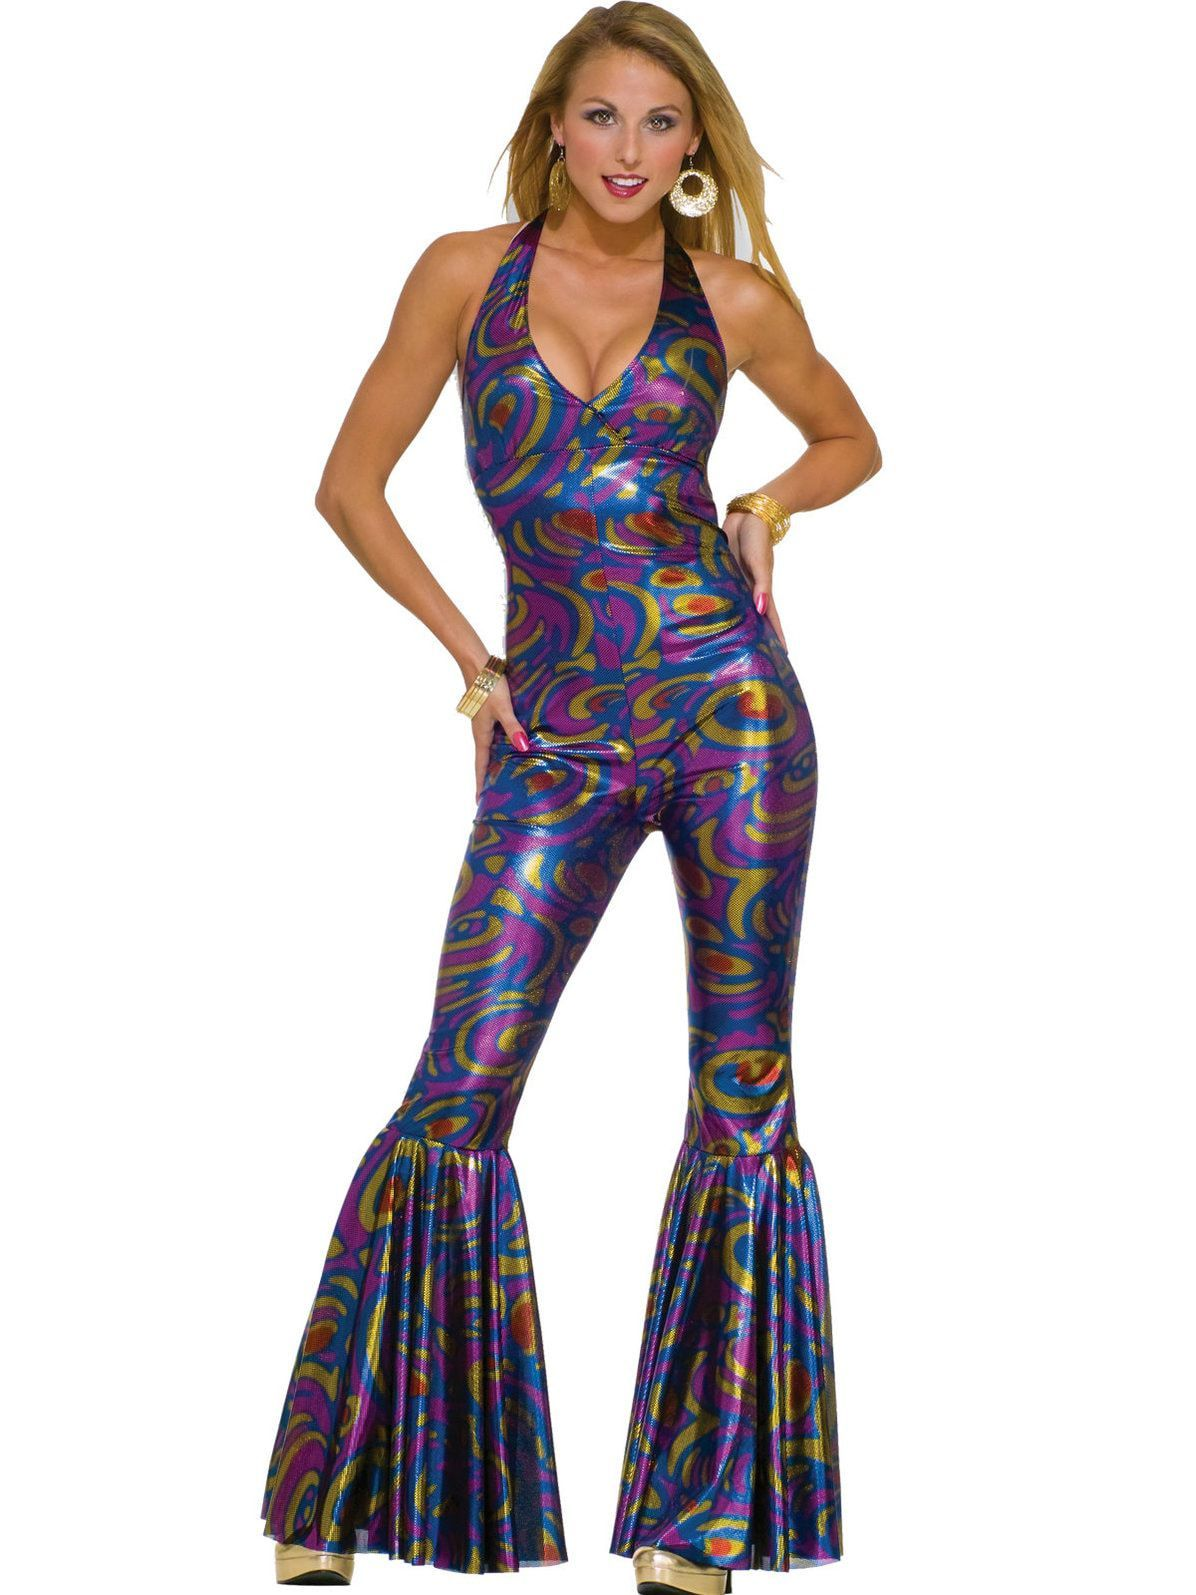 Funky dancinu fox adult costume in s theme costumes